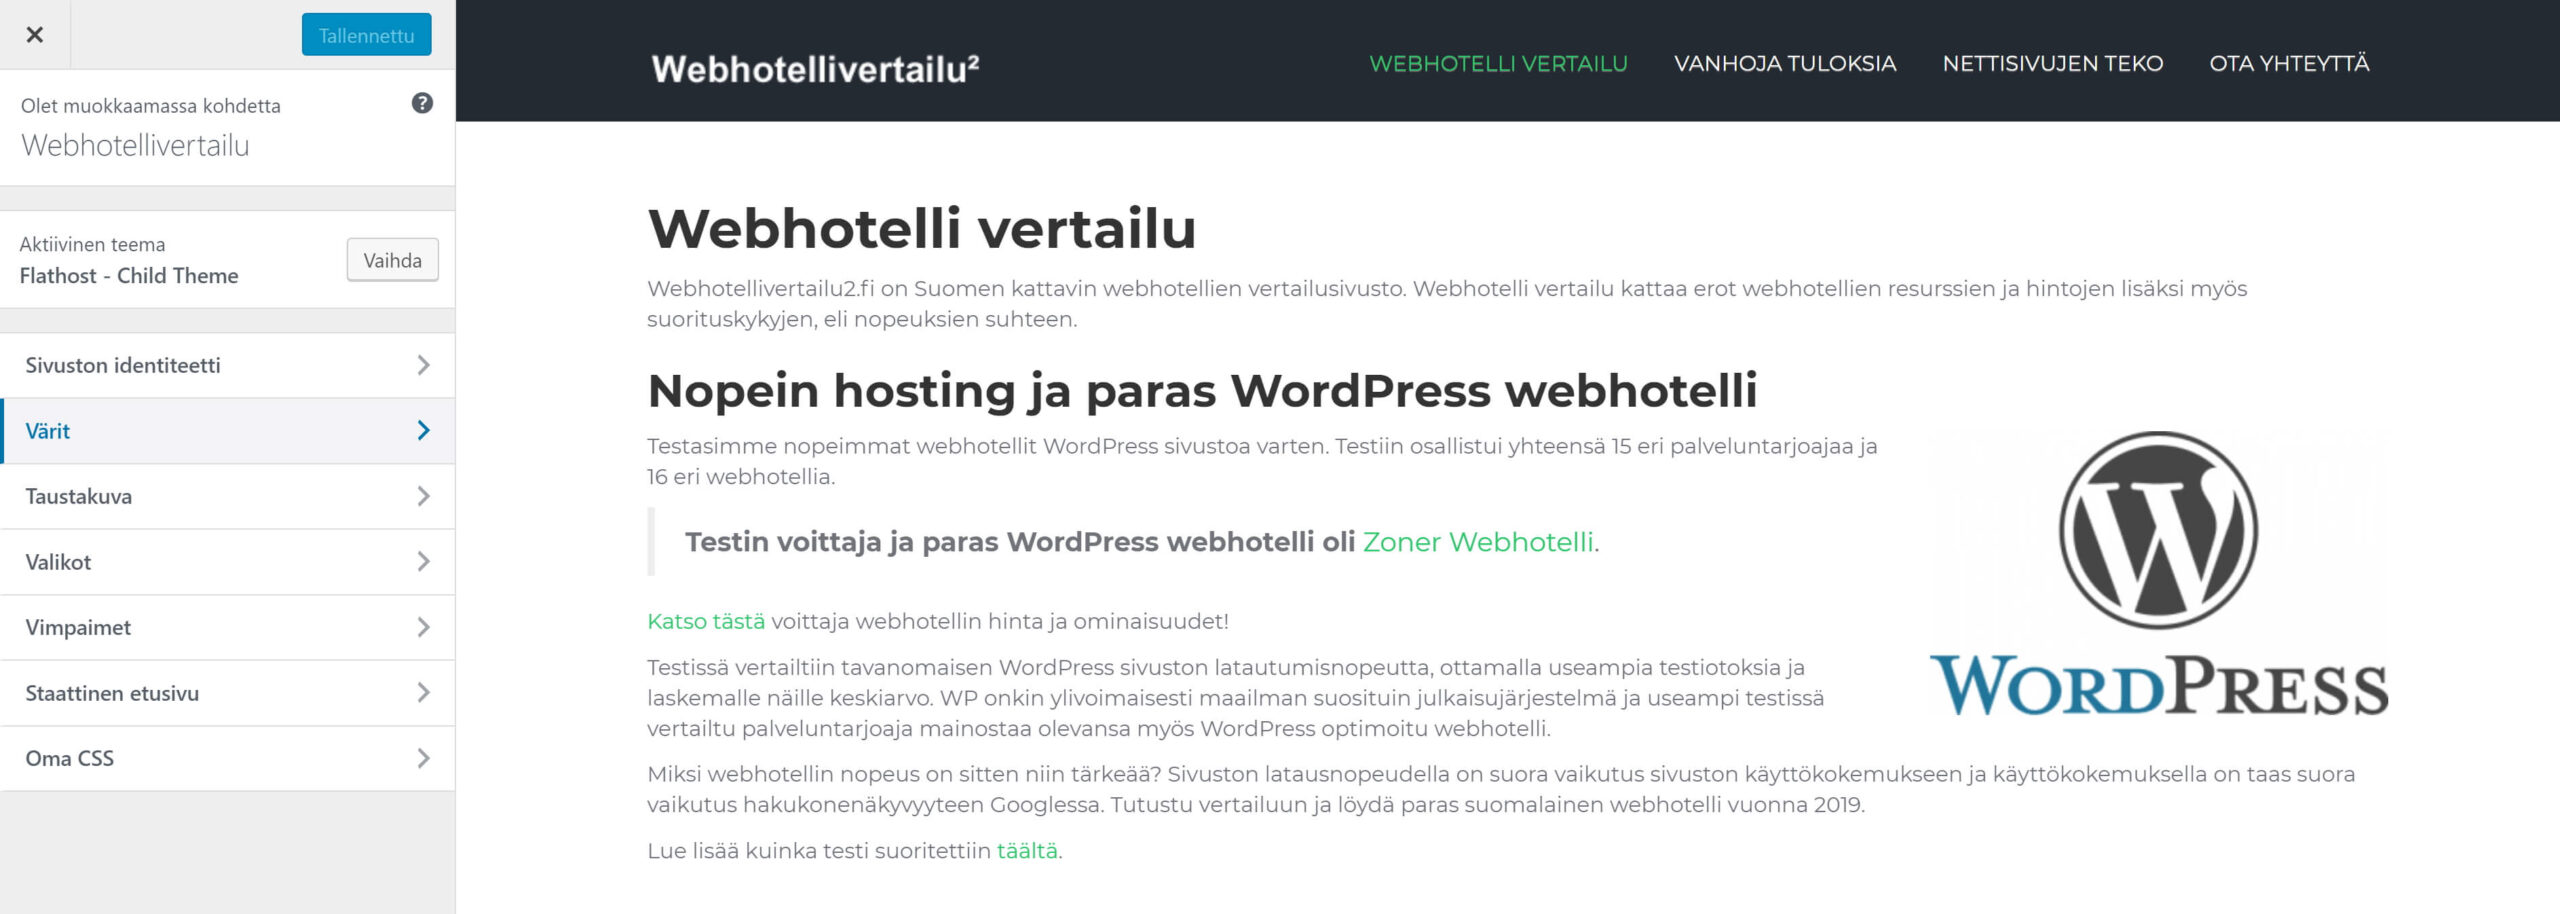 wordpress-teeman muokkaus